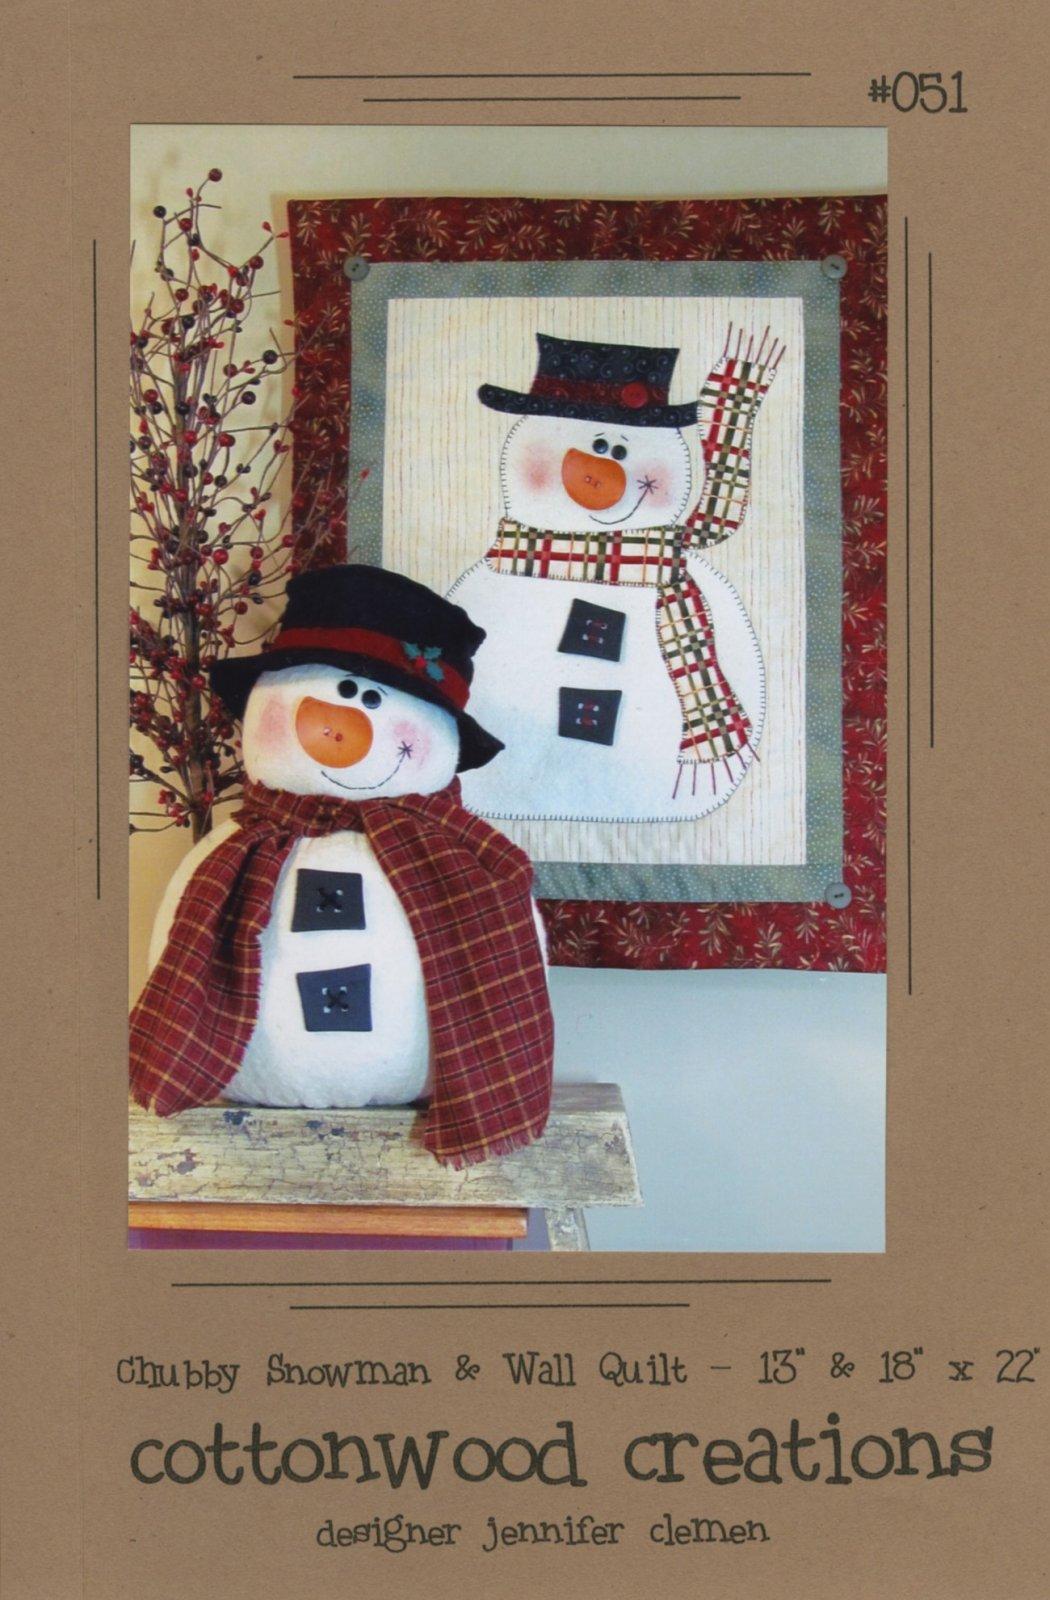 Chubby Snowman & Wall Quilt